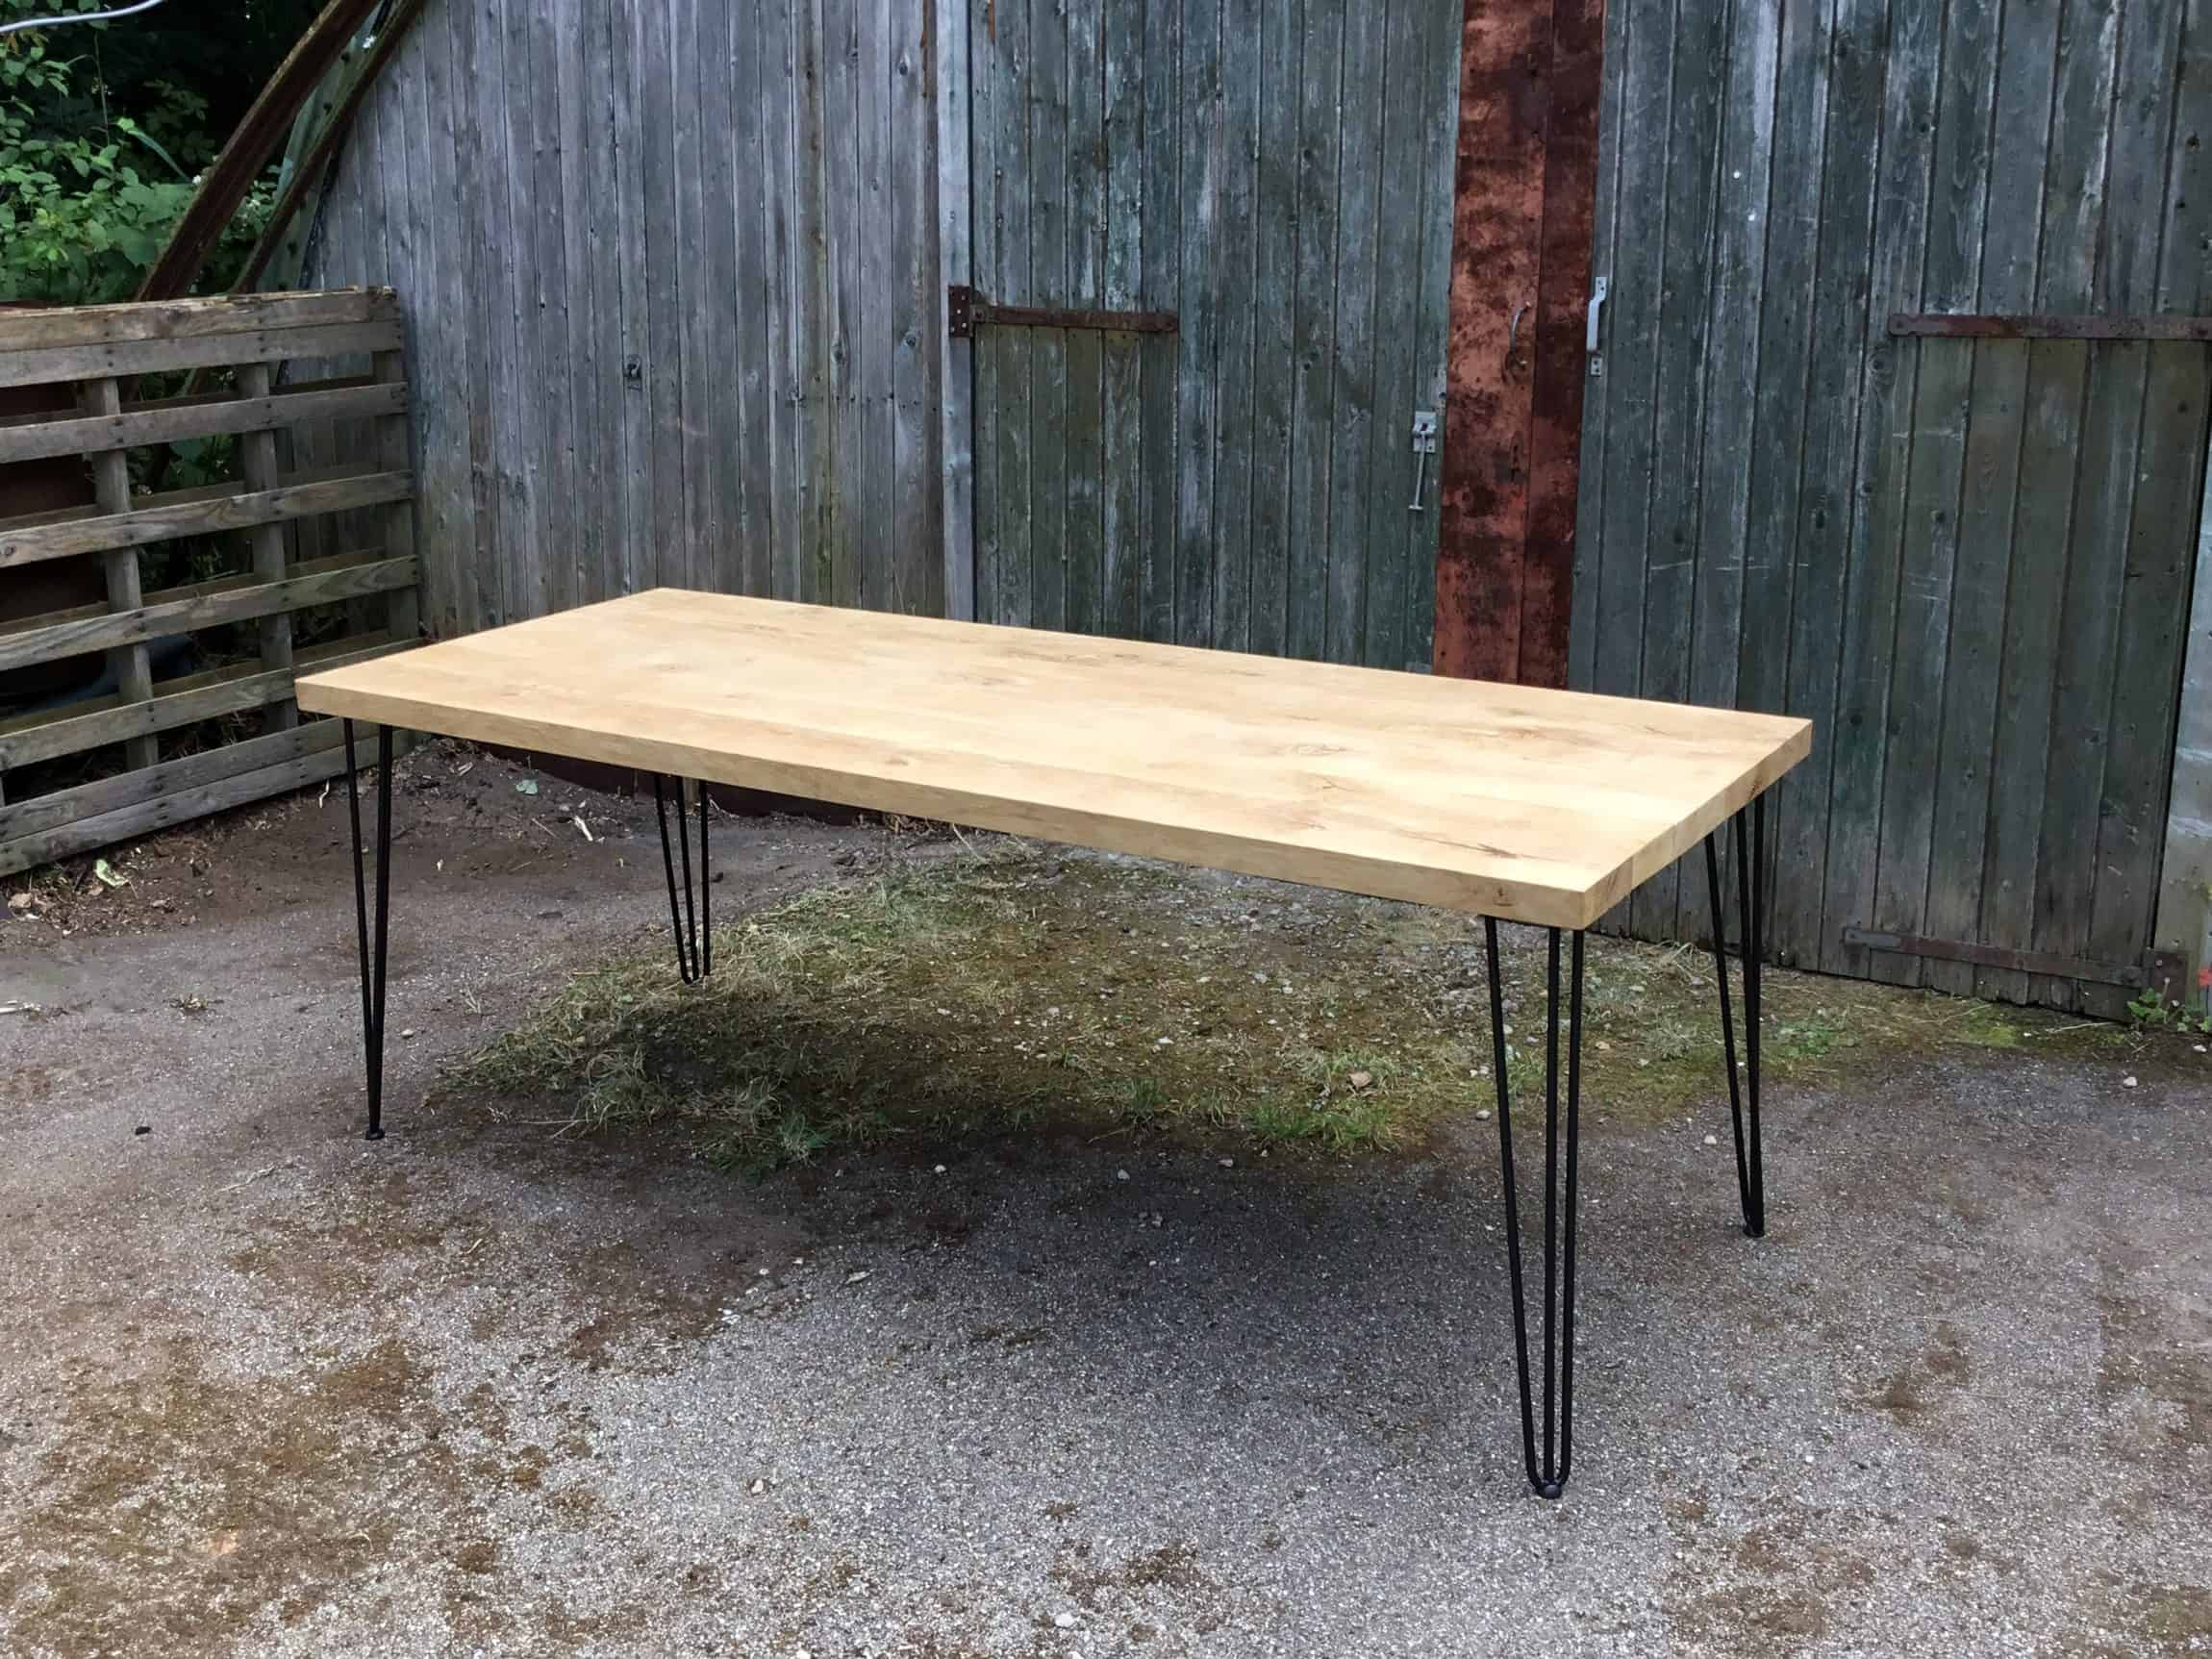 Robuuste Eiken Tafel : Robuuste eiken tafel met kruispoot